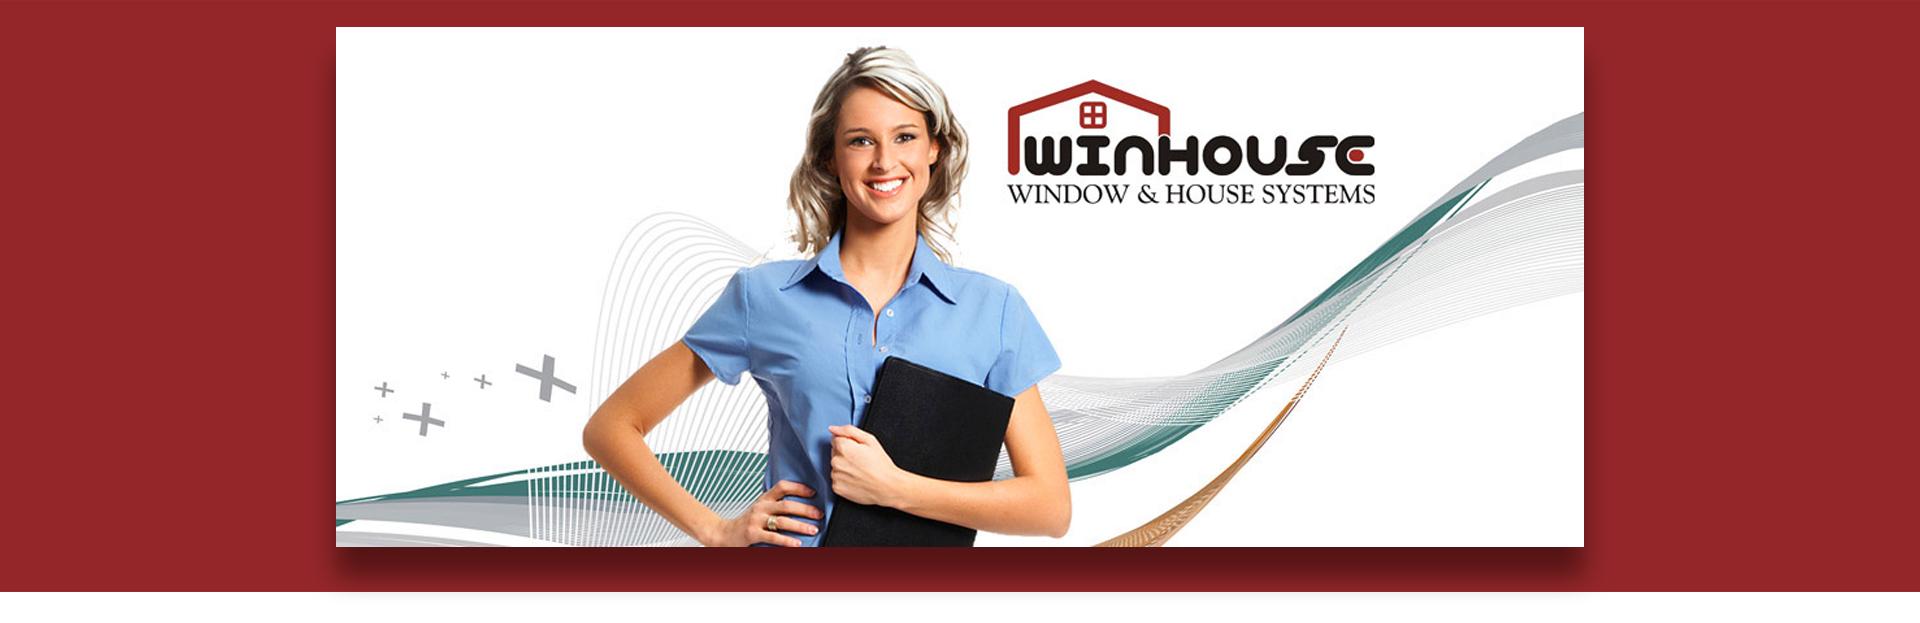 Winhouse_Belgique_chassis_slider-011